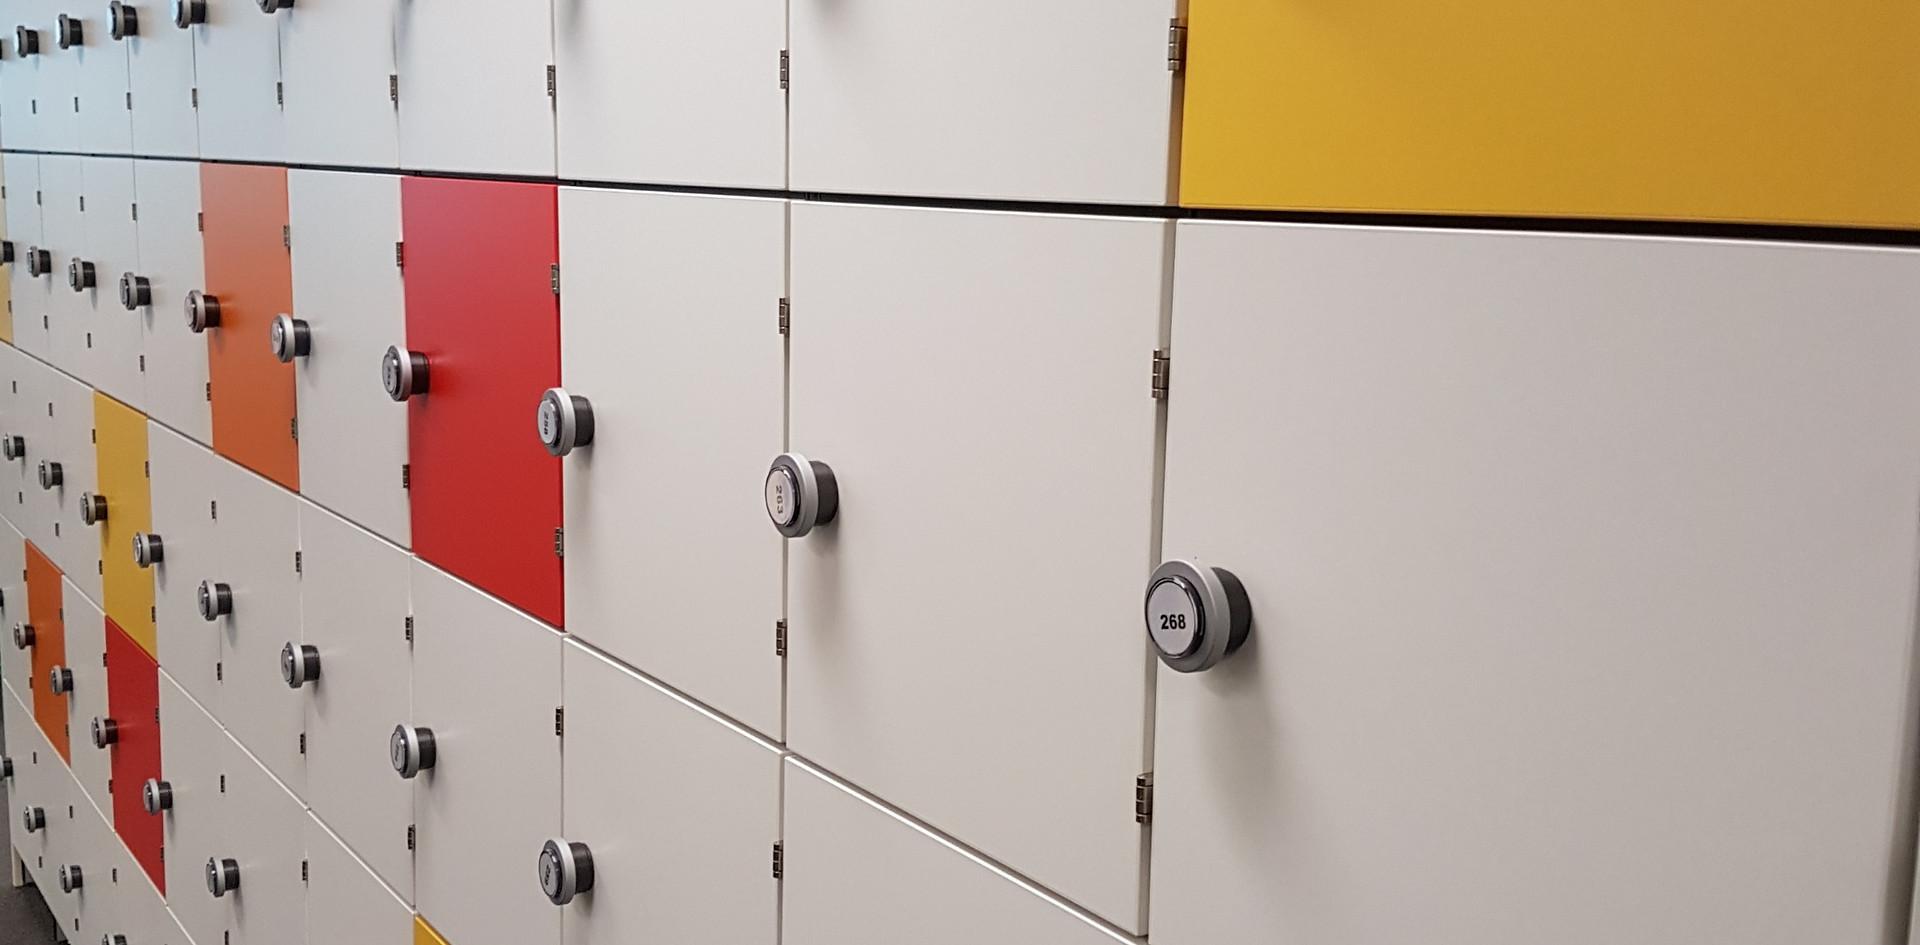 bespoke hot desking lockers with RFID locks